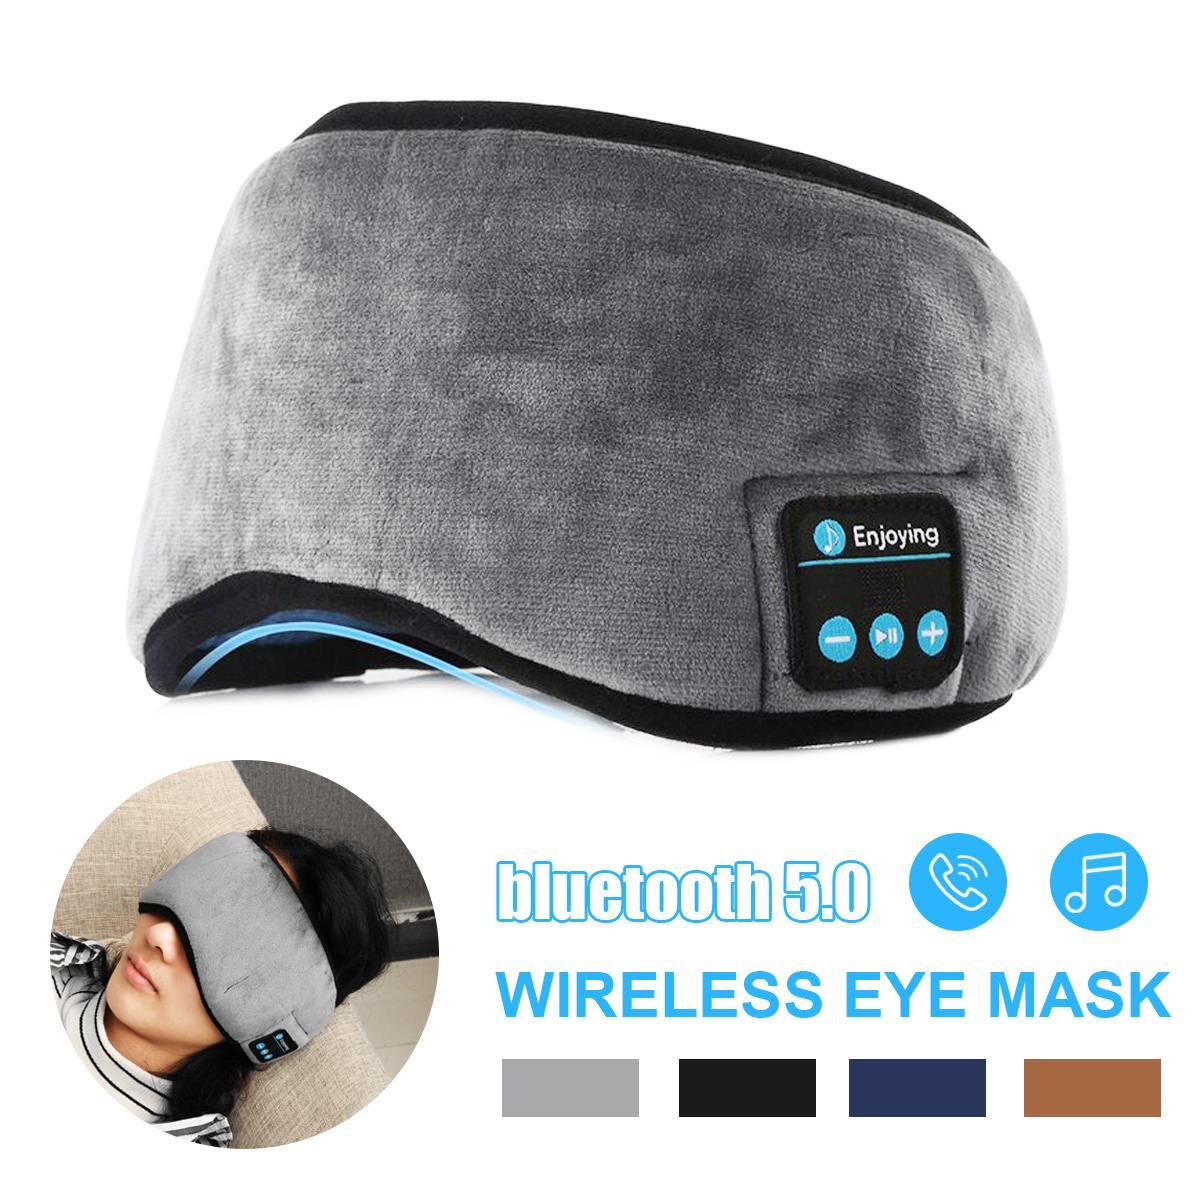 Fones de ouvido sem fio bluetooth máscara